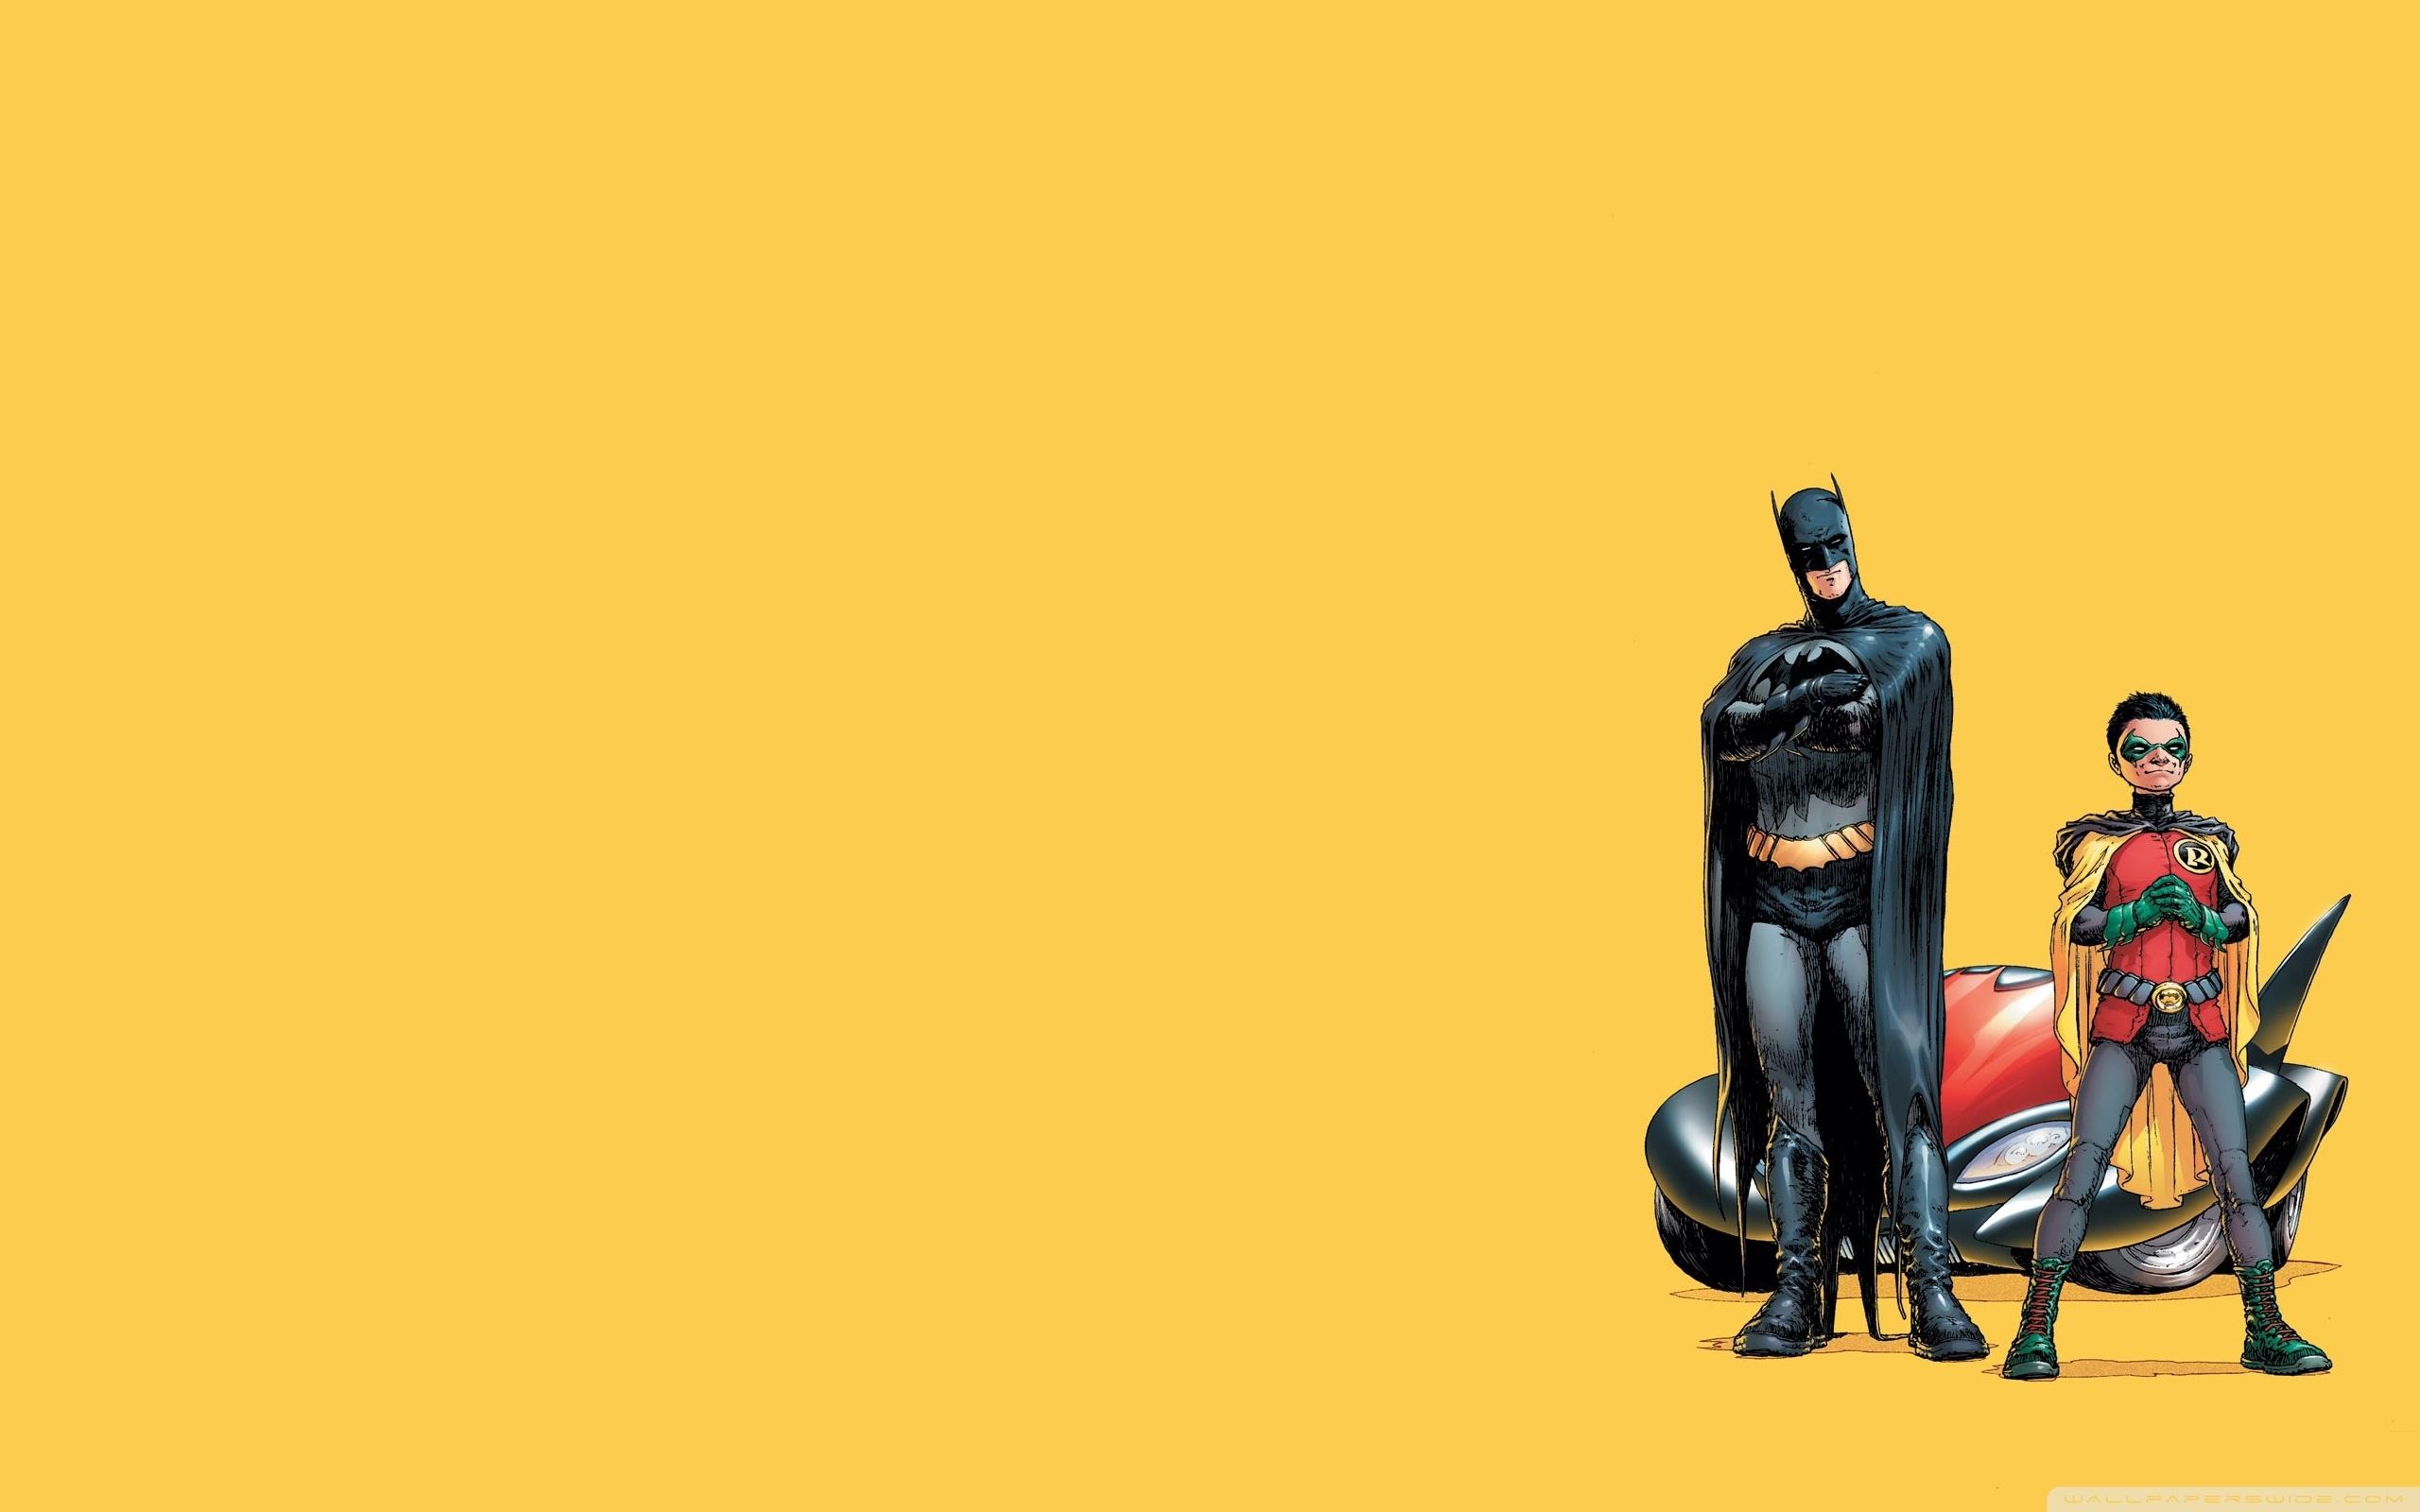 10 Top Batman Cartoon Wallpaper Hd Full Hd 1080p For Pc